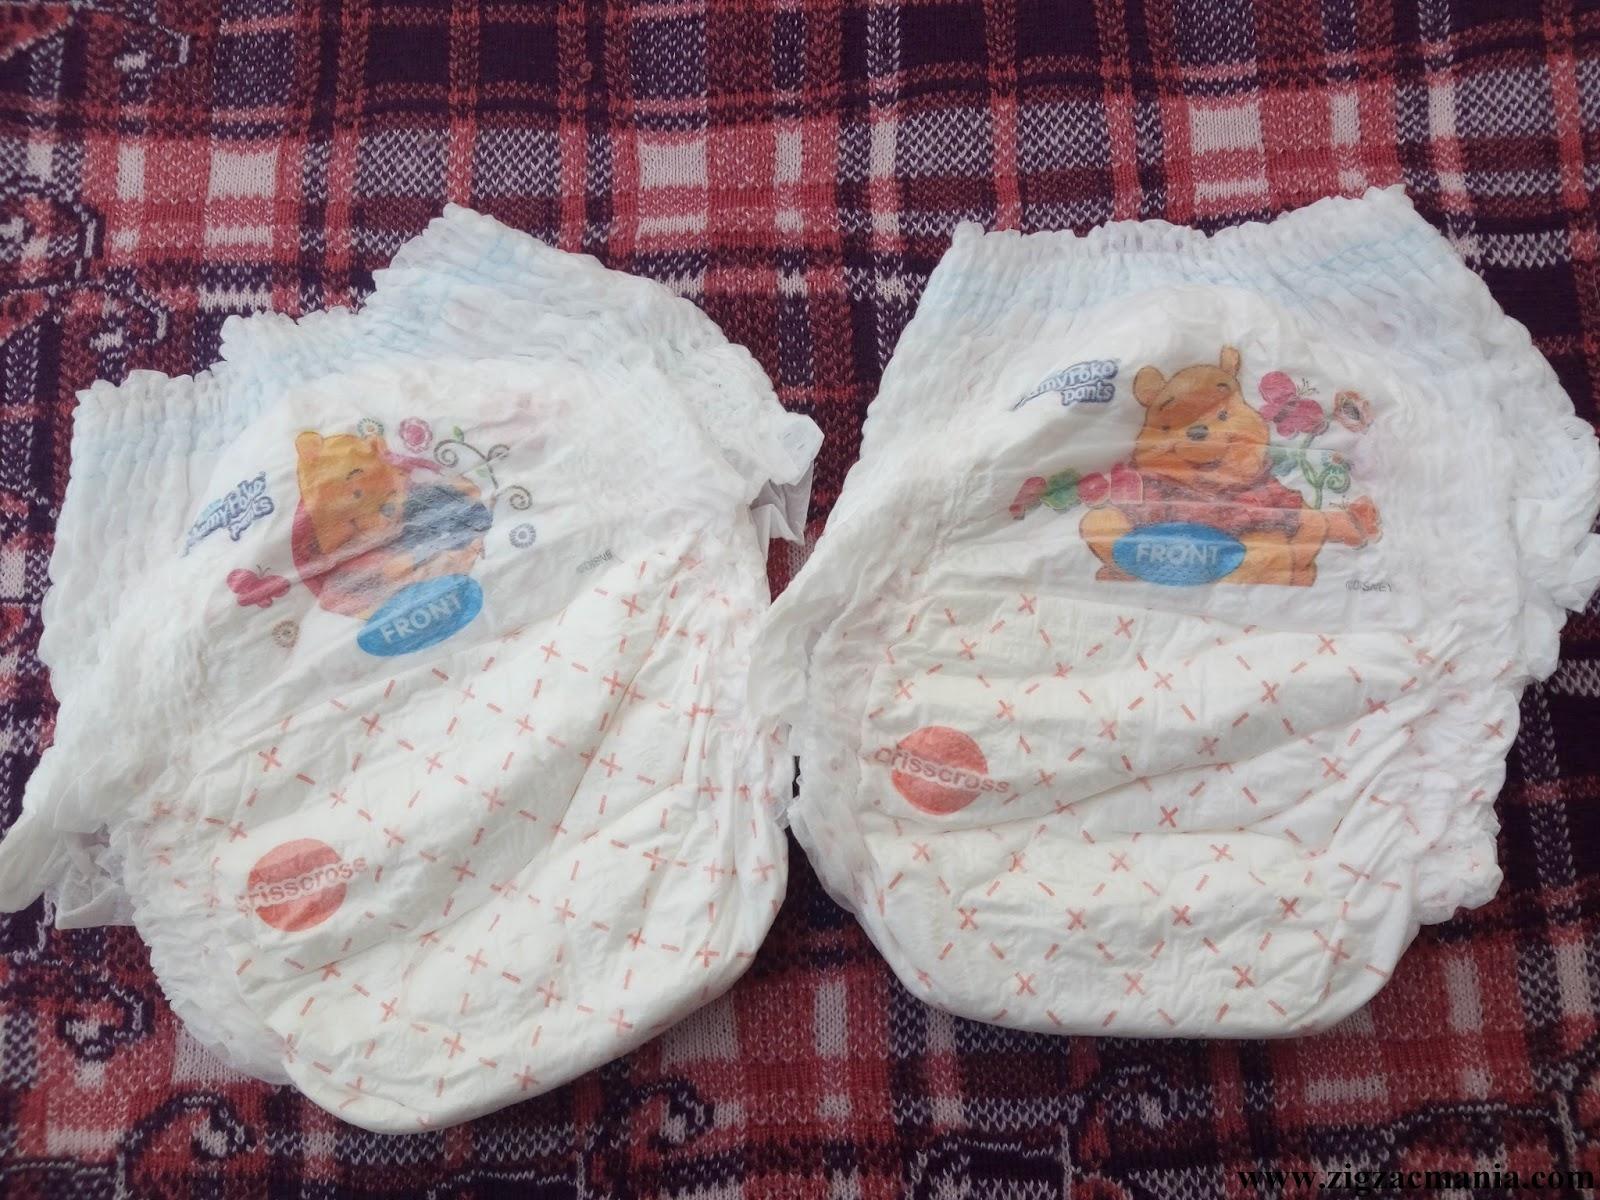 Himalaya Baby Diapers Review Zig Zac Mania Mamypoko Tape Small Packet Diaper Rash Cream Mamy Poko Pants Style